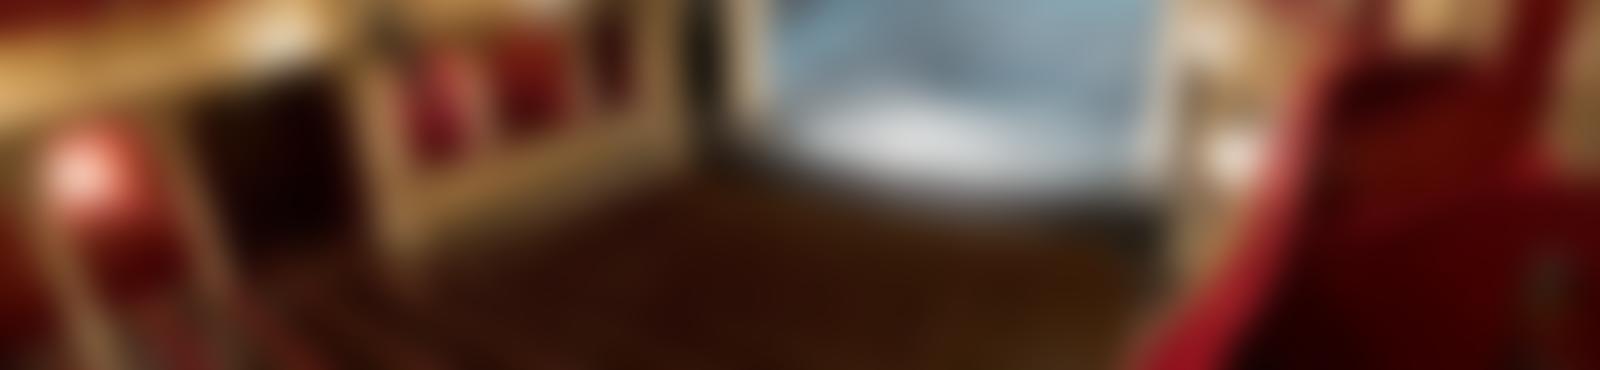 Blurred ffdeddb0 b3c9 42dd aac6 56b31652aa53